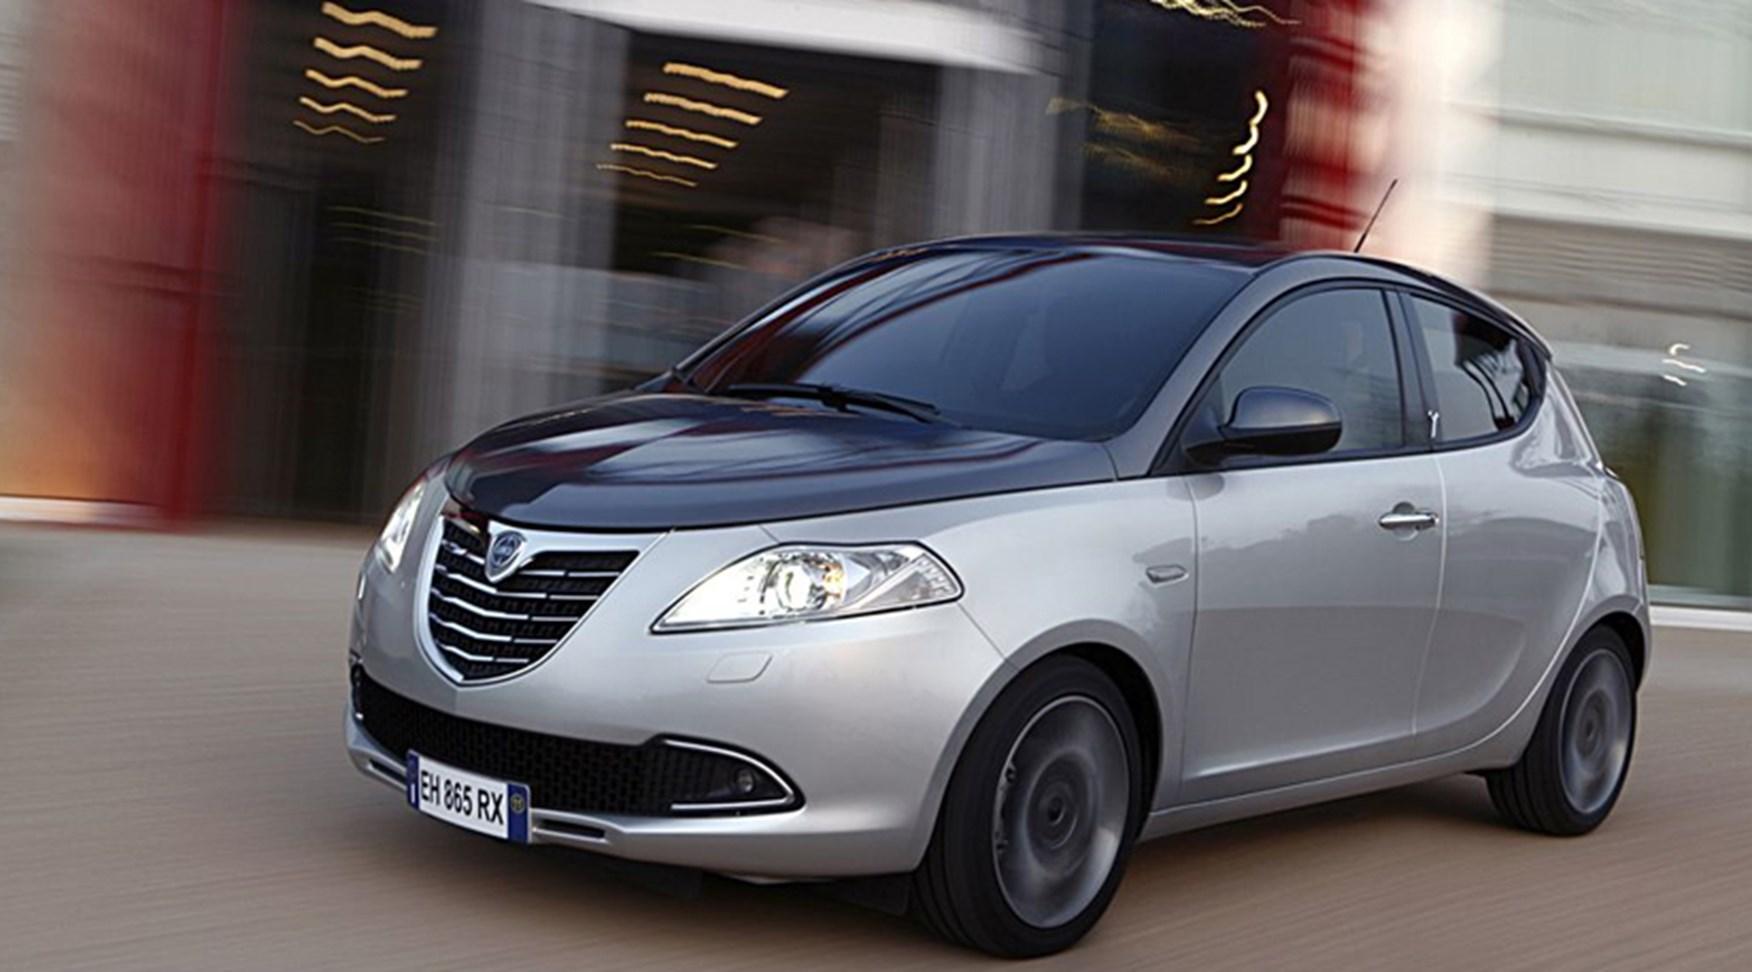 Chrysler Ypsilon 0.9 TwinAir (2011) review | CAR Magazine